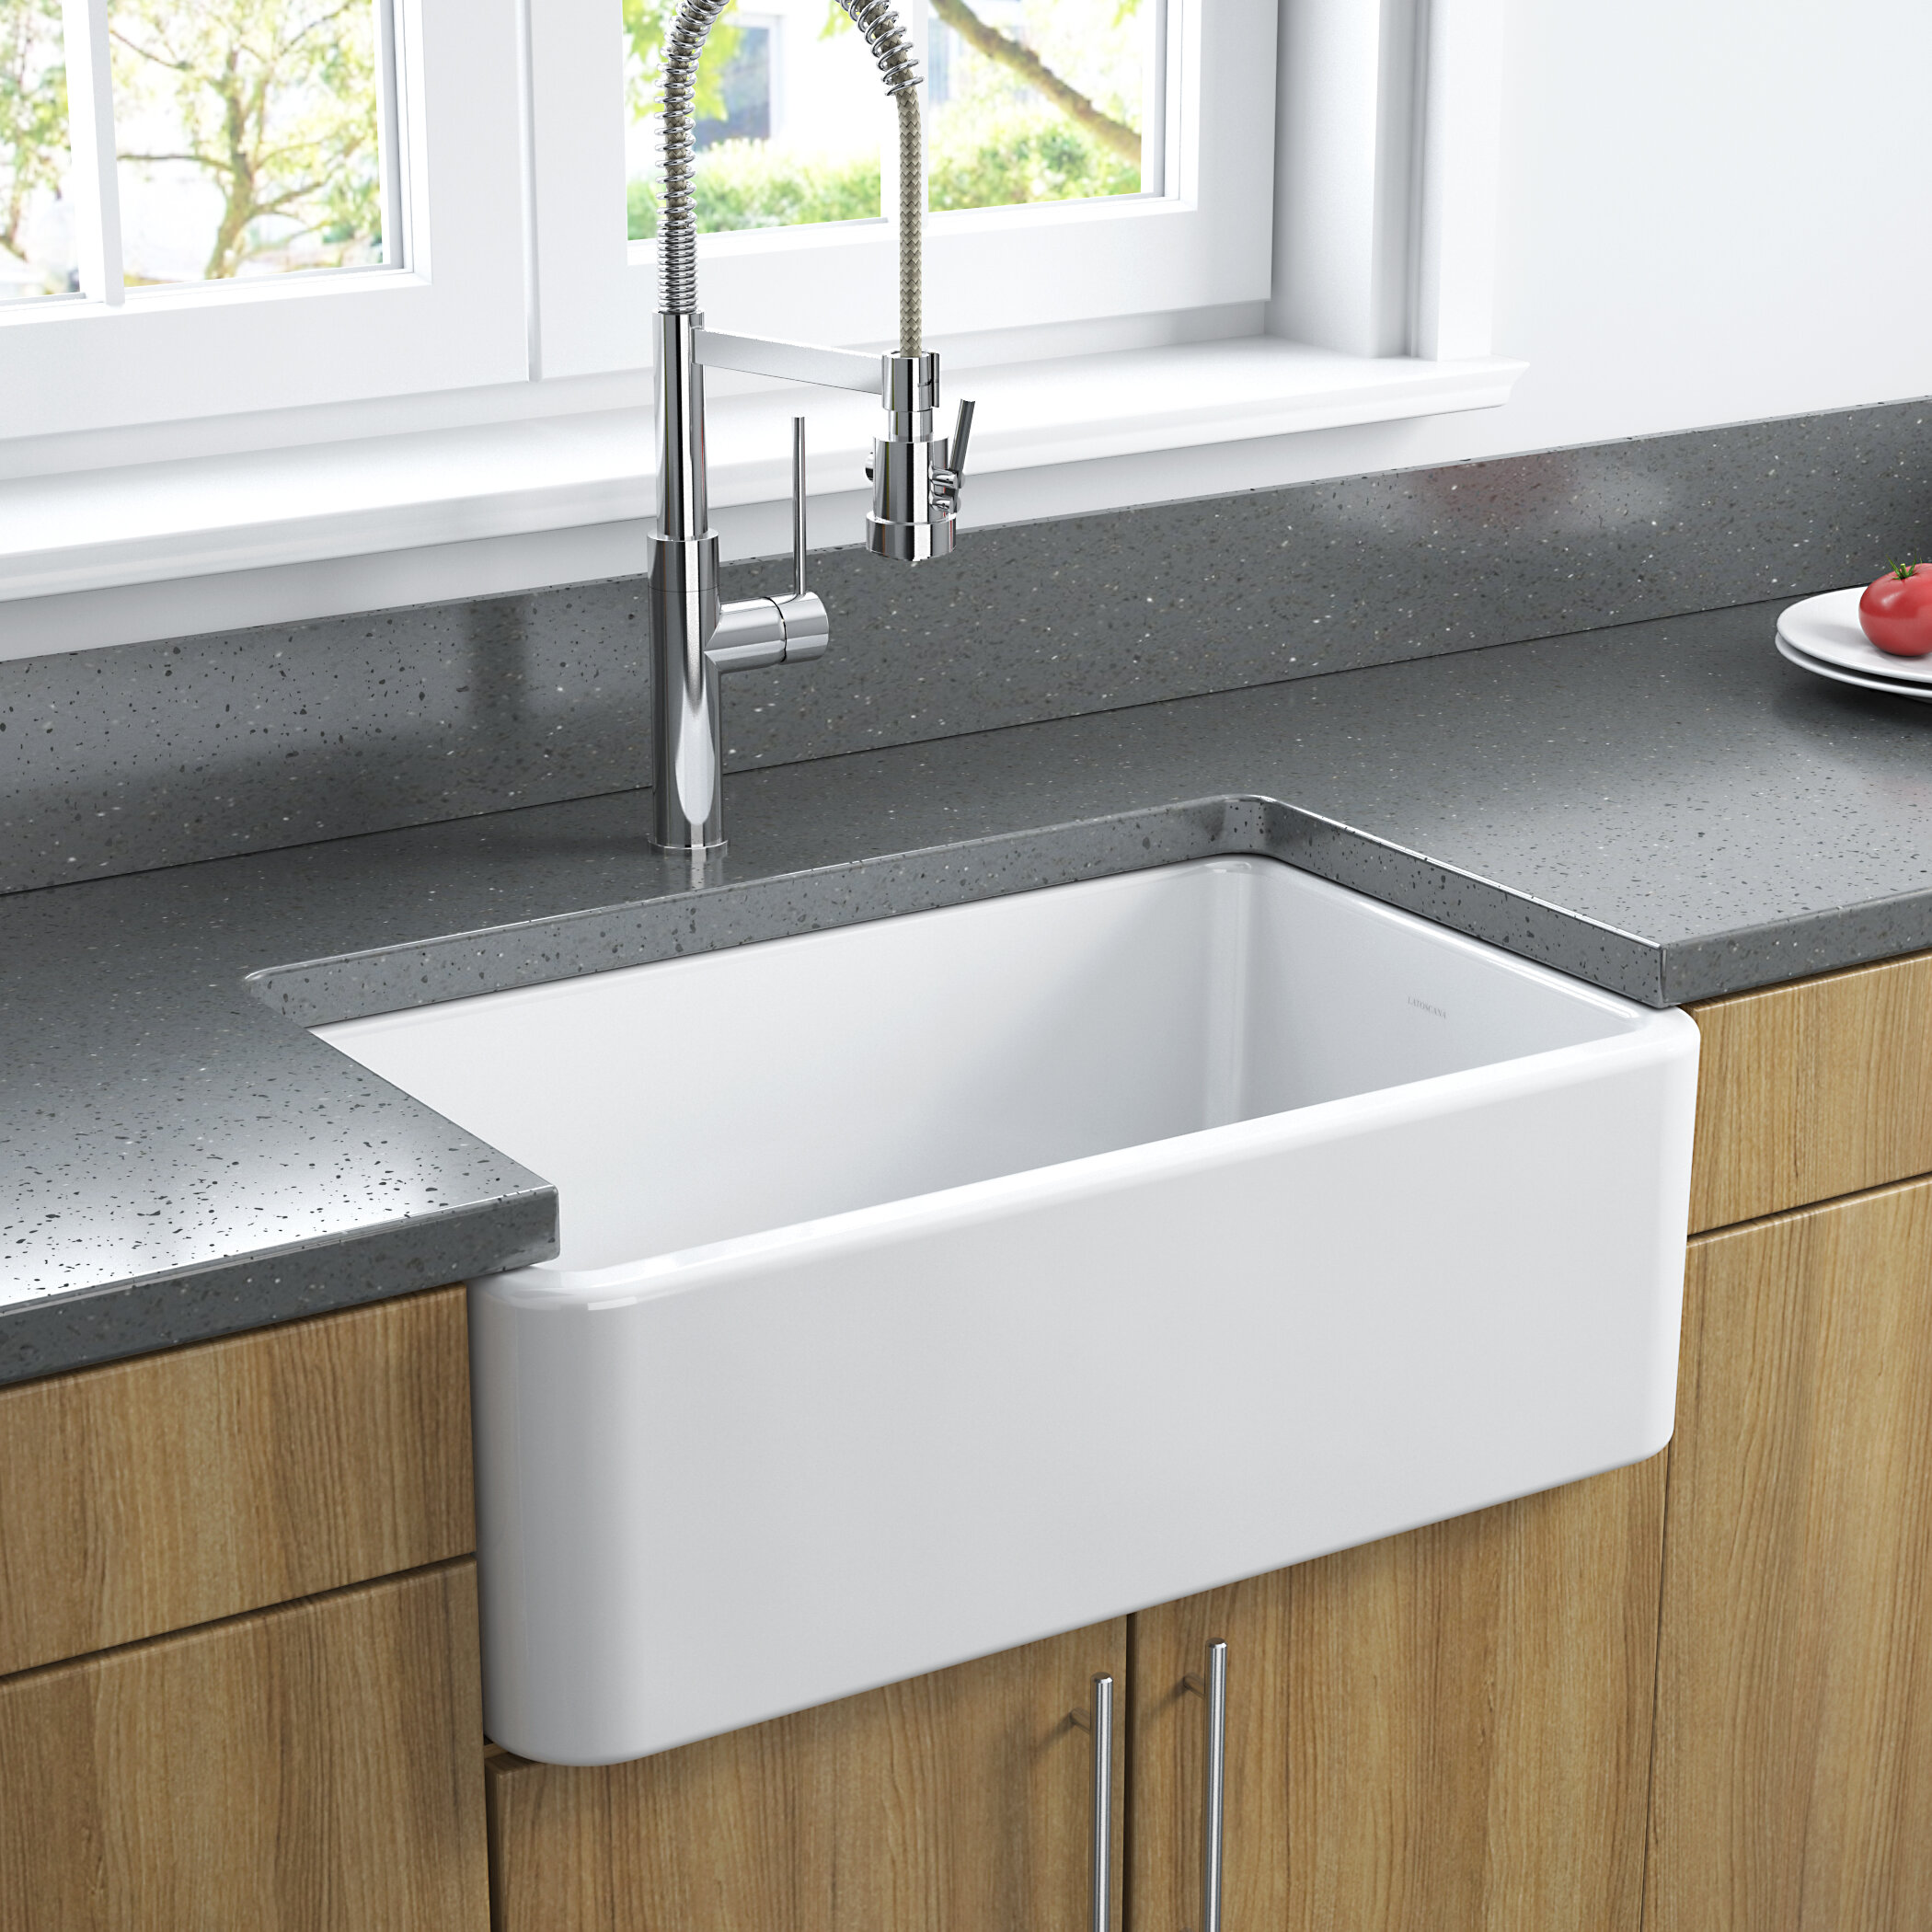 Latoscana 30 L X 18 W Fireclay Farmhouse Reversible Kitchen Sink Reviews Wayfair